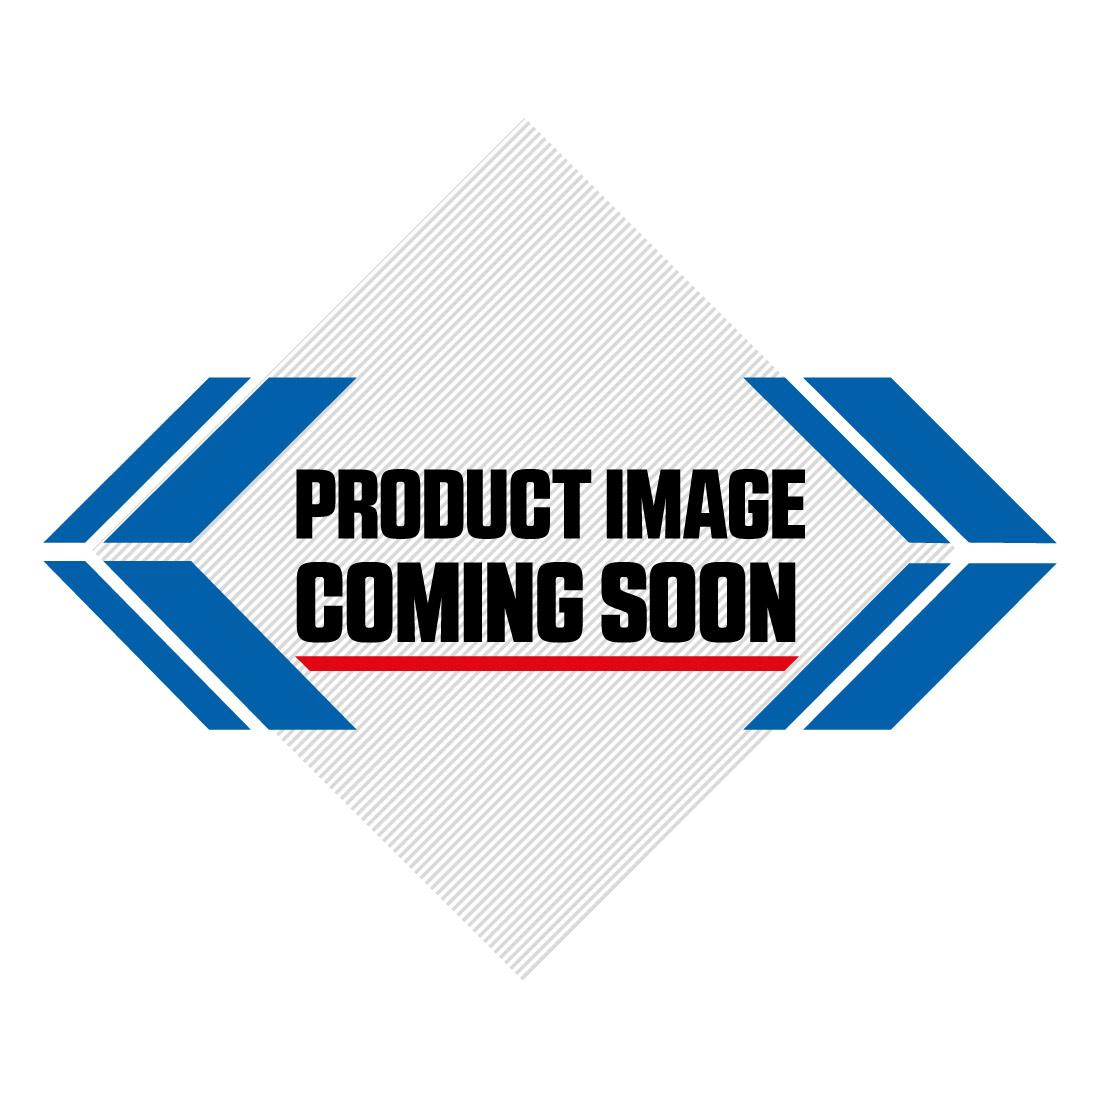 Swingarm chain slider KTM SX 65 - Black Col 001